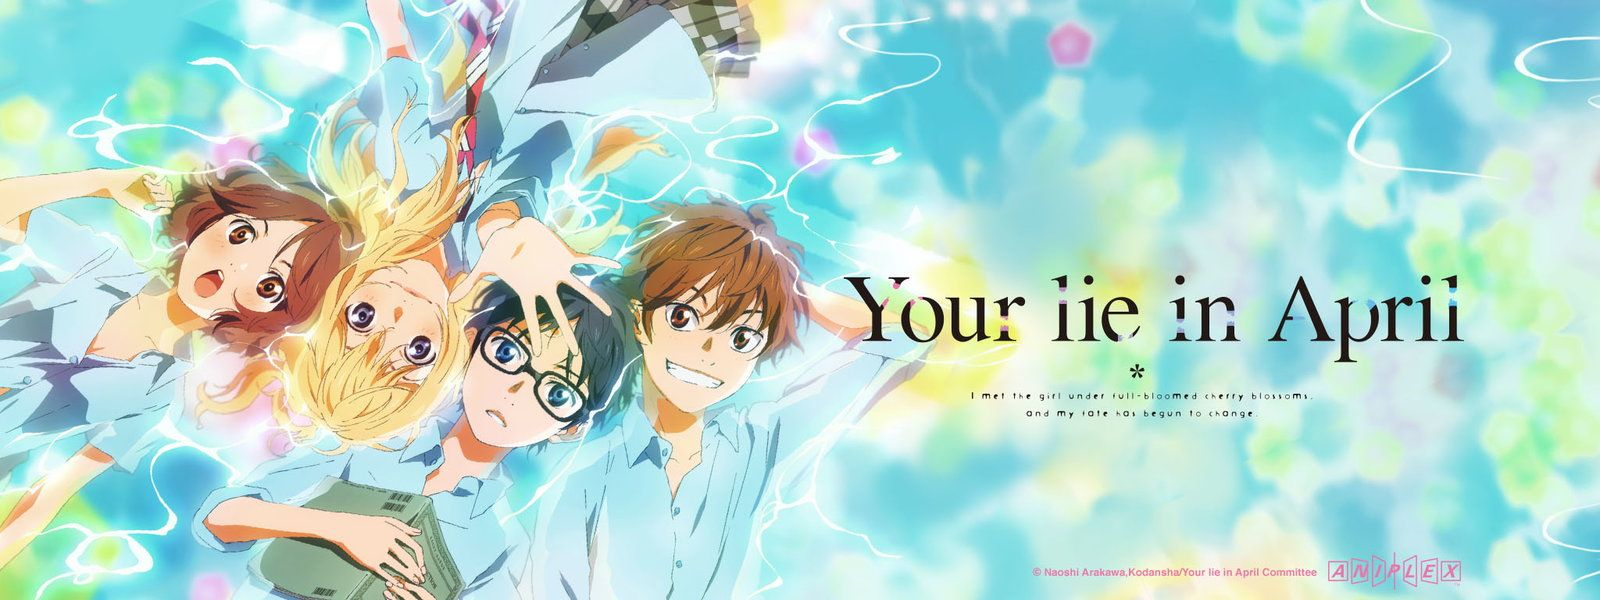 Your Lie In April Your Lie In April You Lied Anime Watch